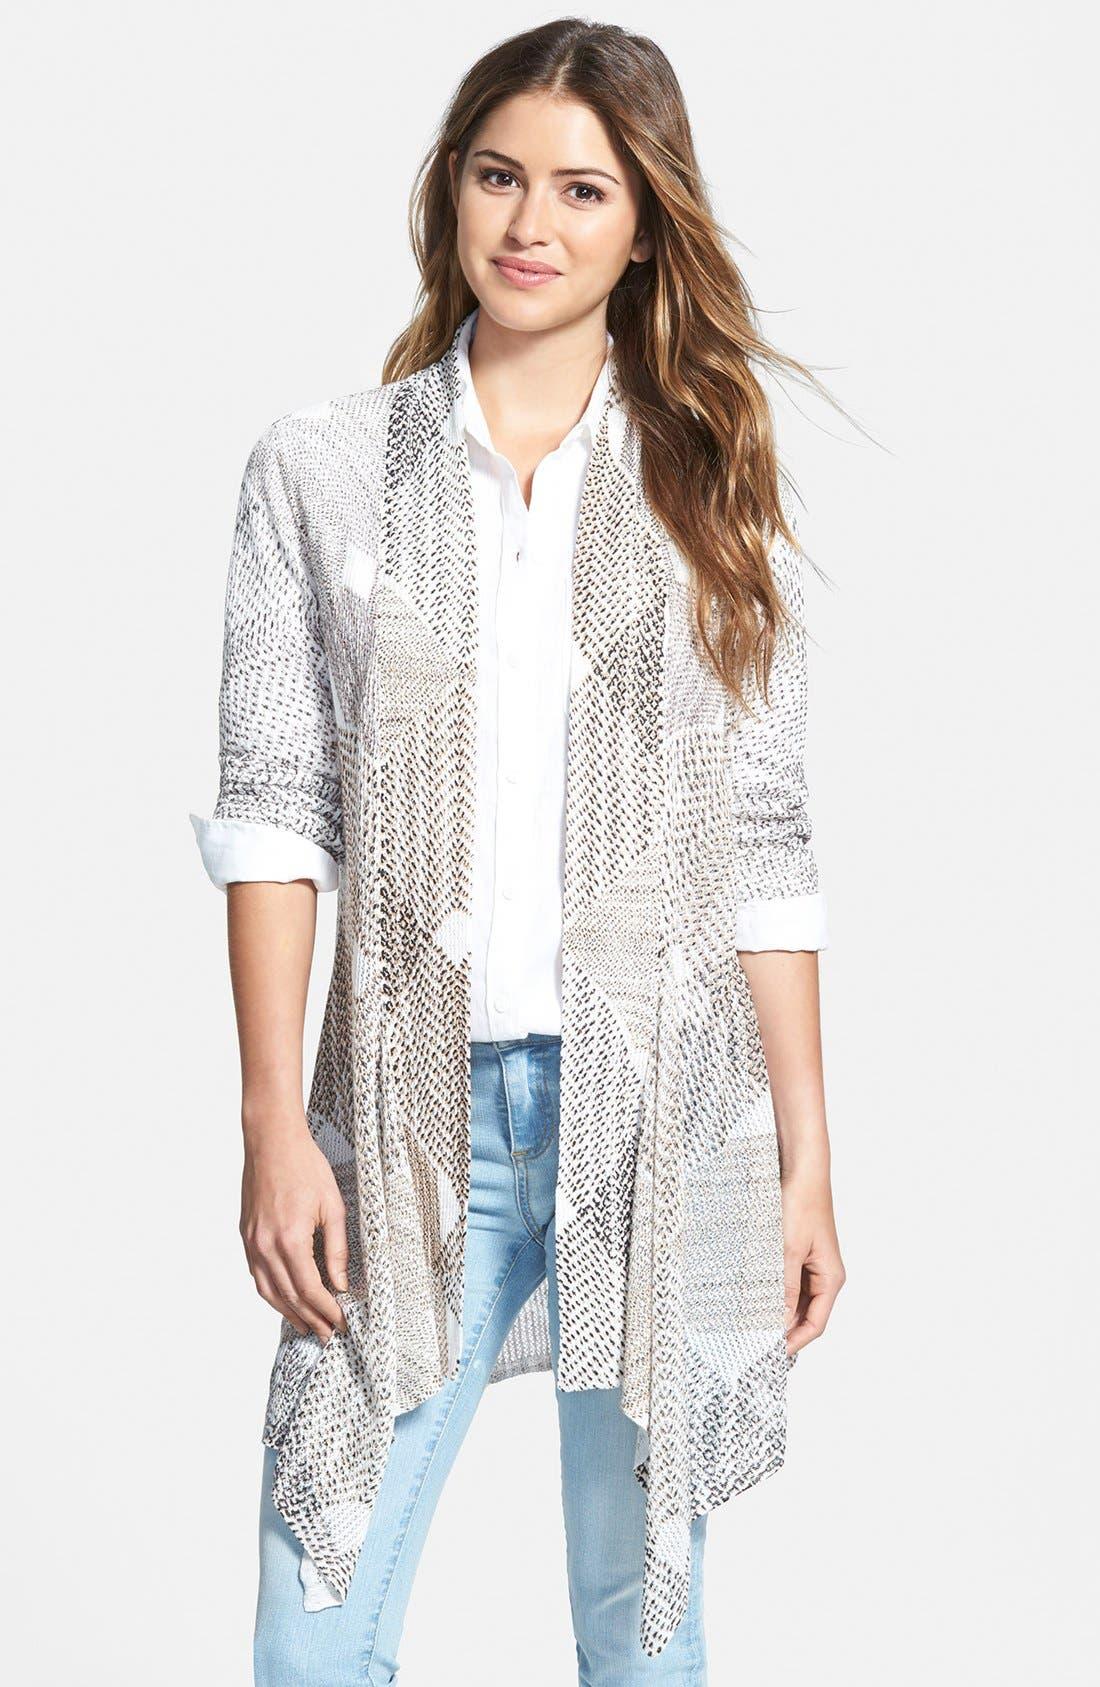 Main Image - NIC+ZOE 'Dashed Diamonds' Long Cardigan (Regular & Petite)